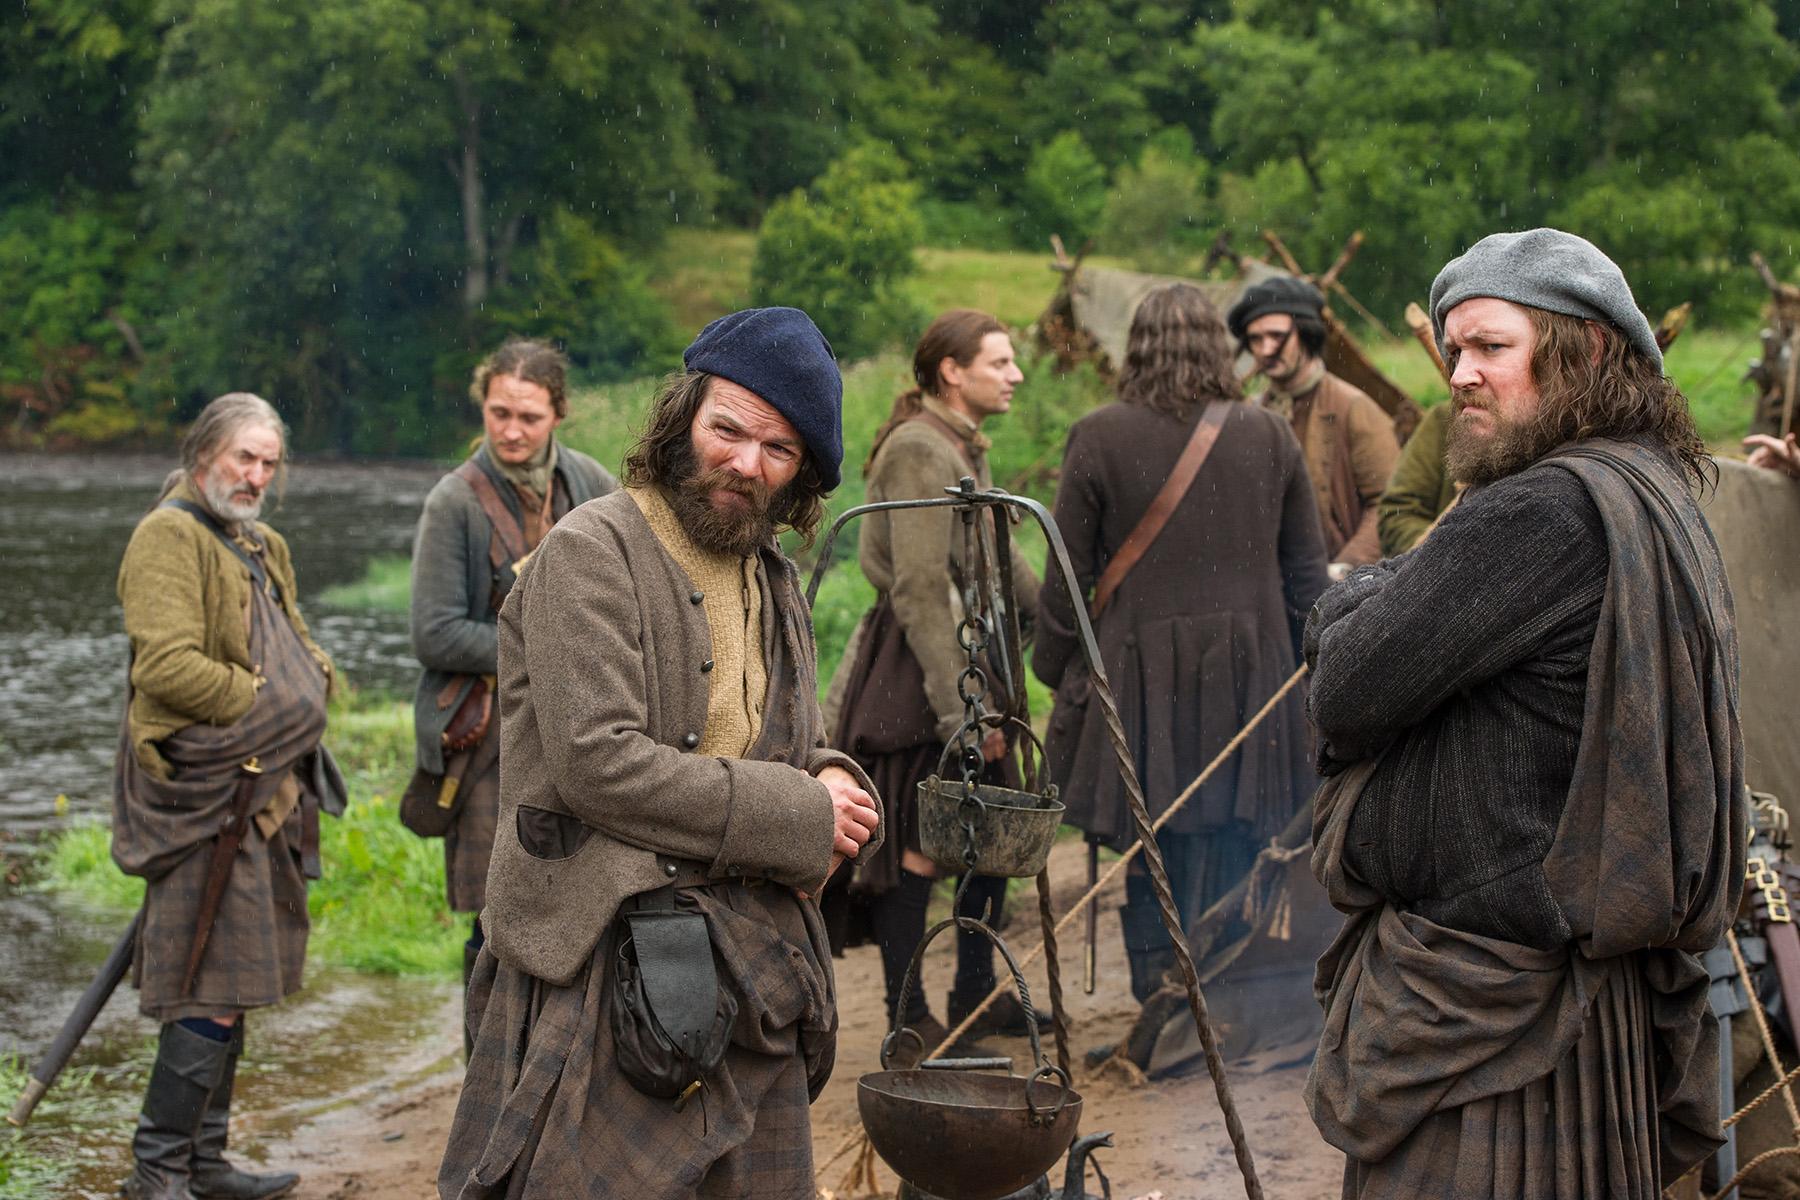 Angus Mhor (Stephen Walters) and Rupert MacKenzie (Grant O'Rourke)